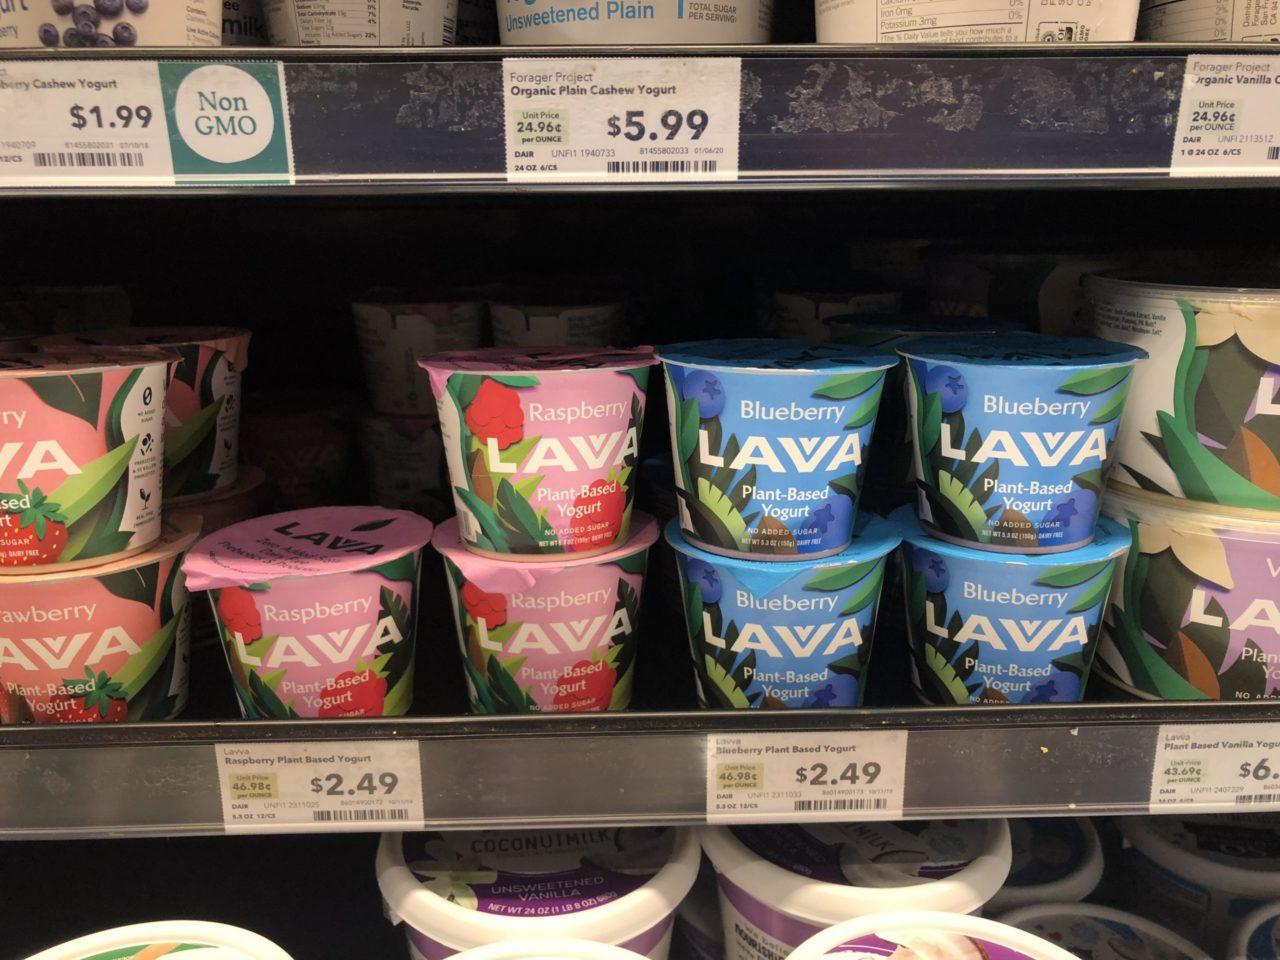 As Seen on the Shelves: Plant-Based Yogurt